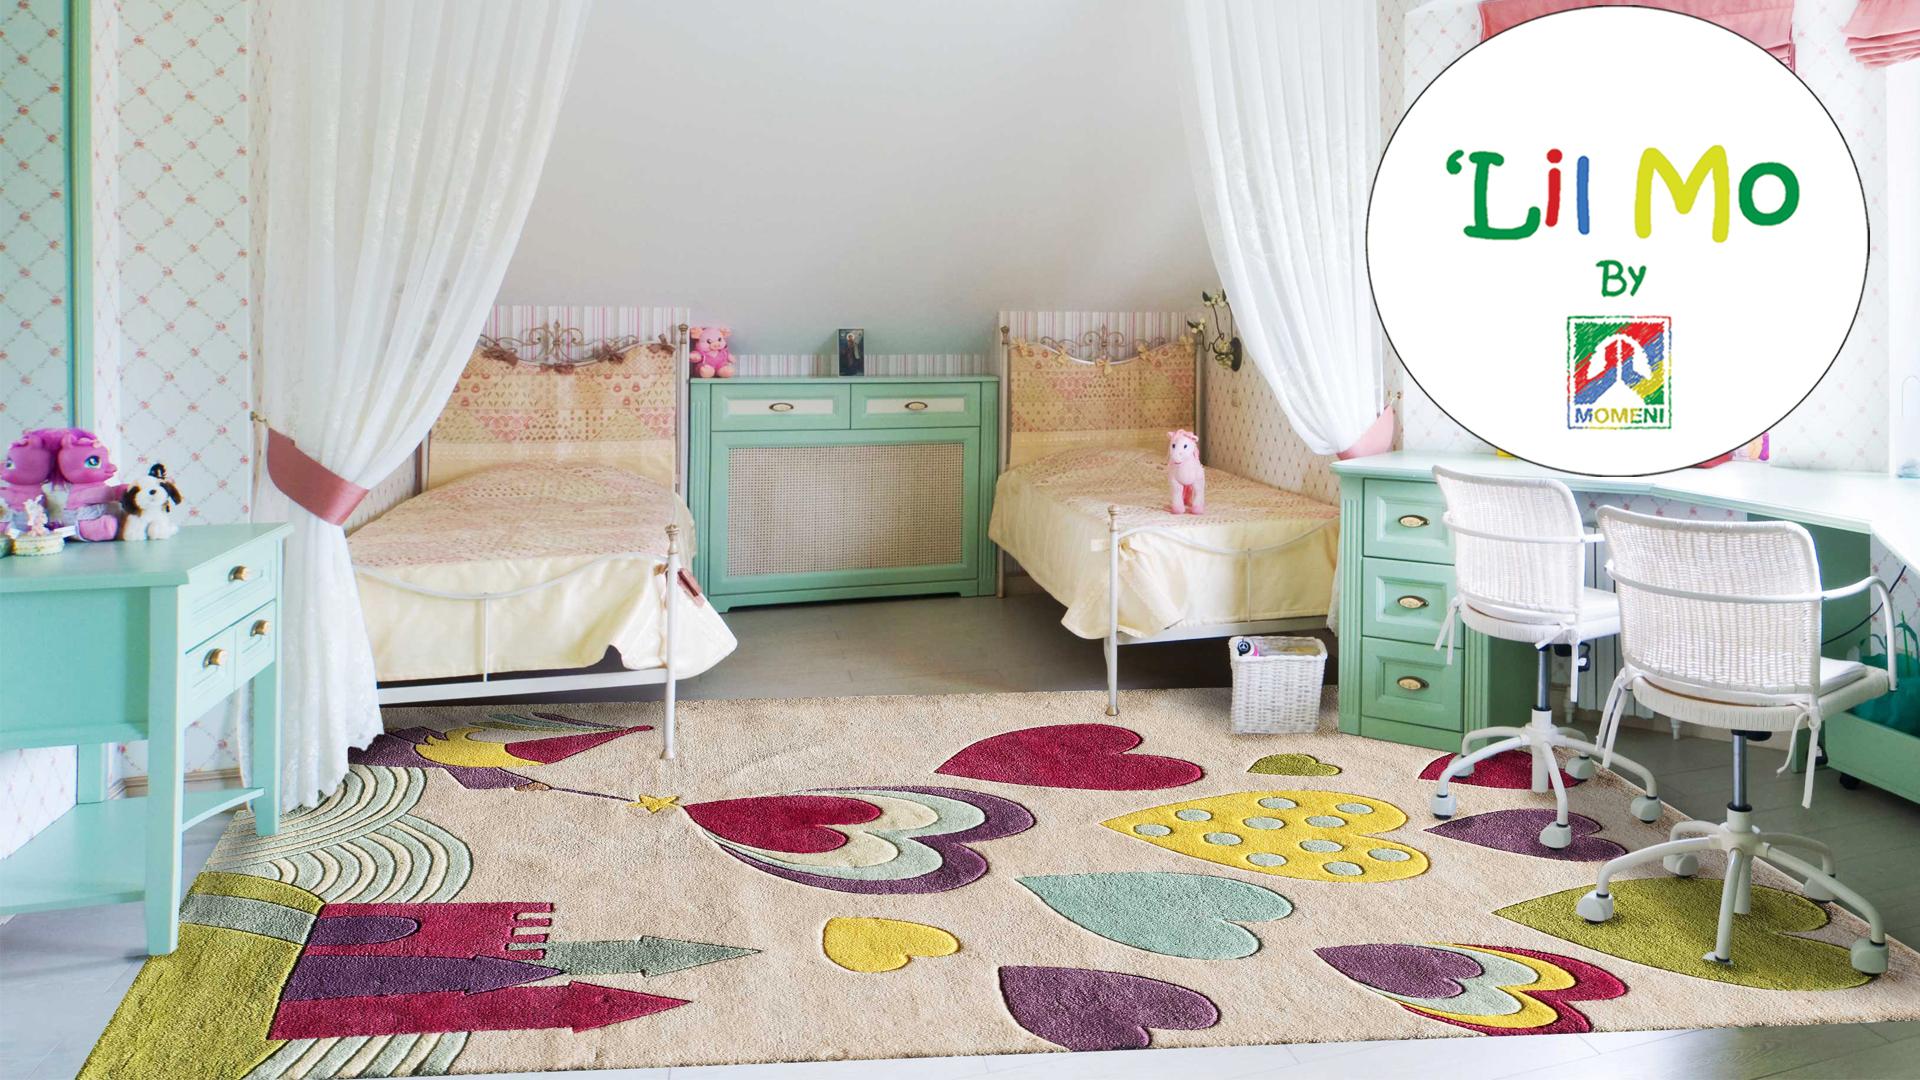 Elegant 1; 2; 3. Momeni 2016 Catalog momeni area rugs